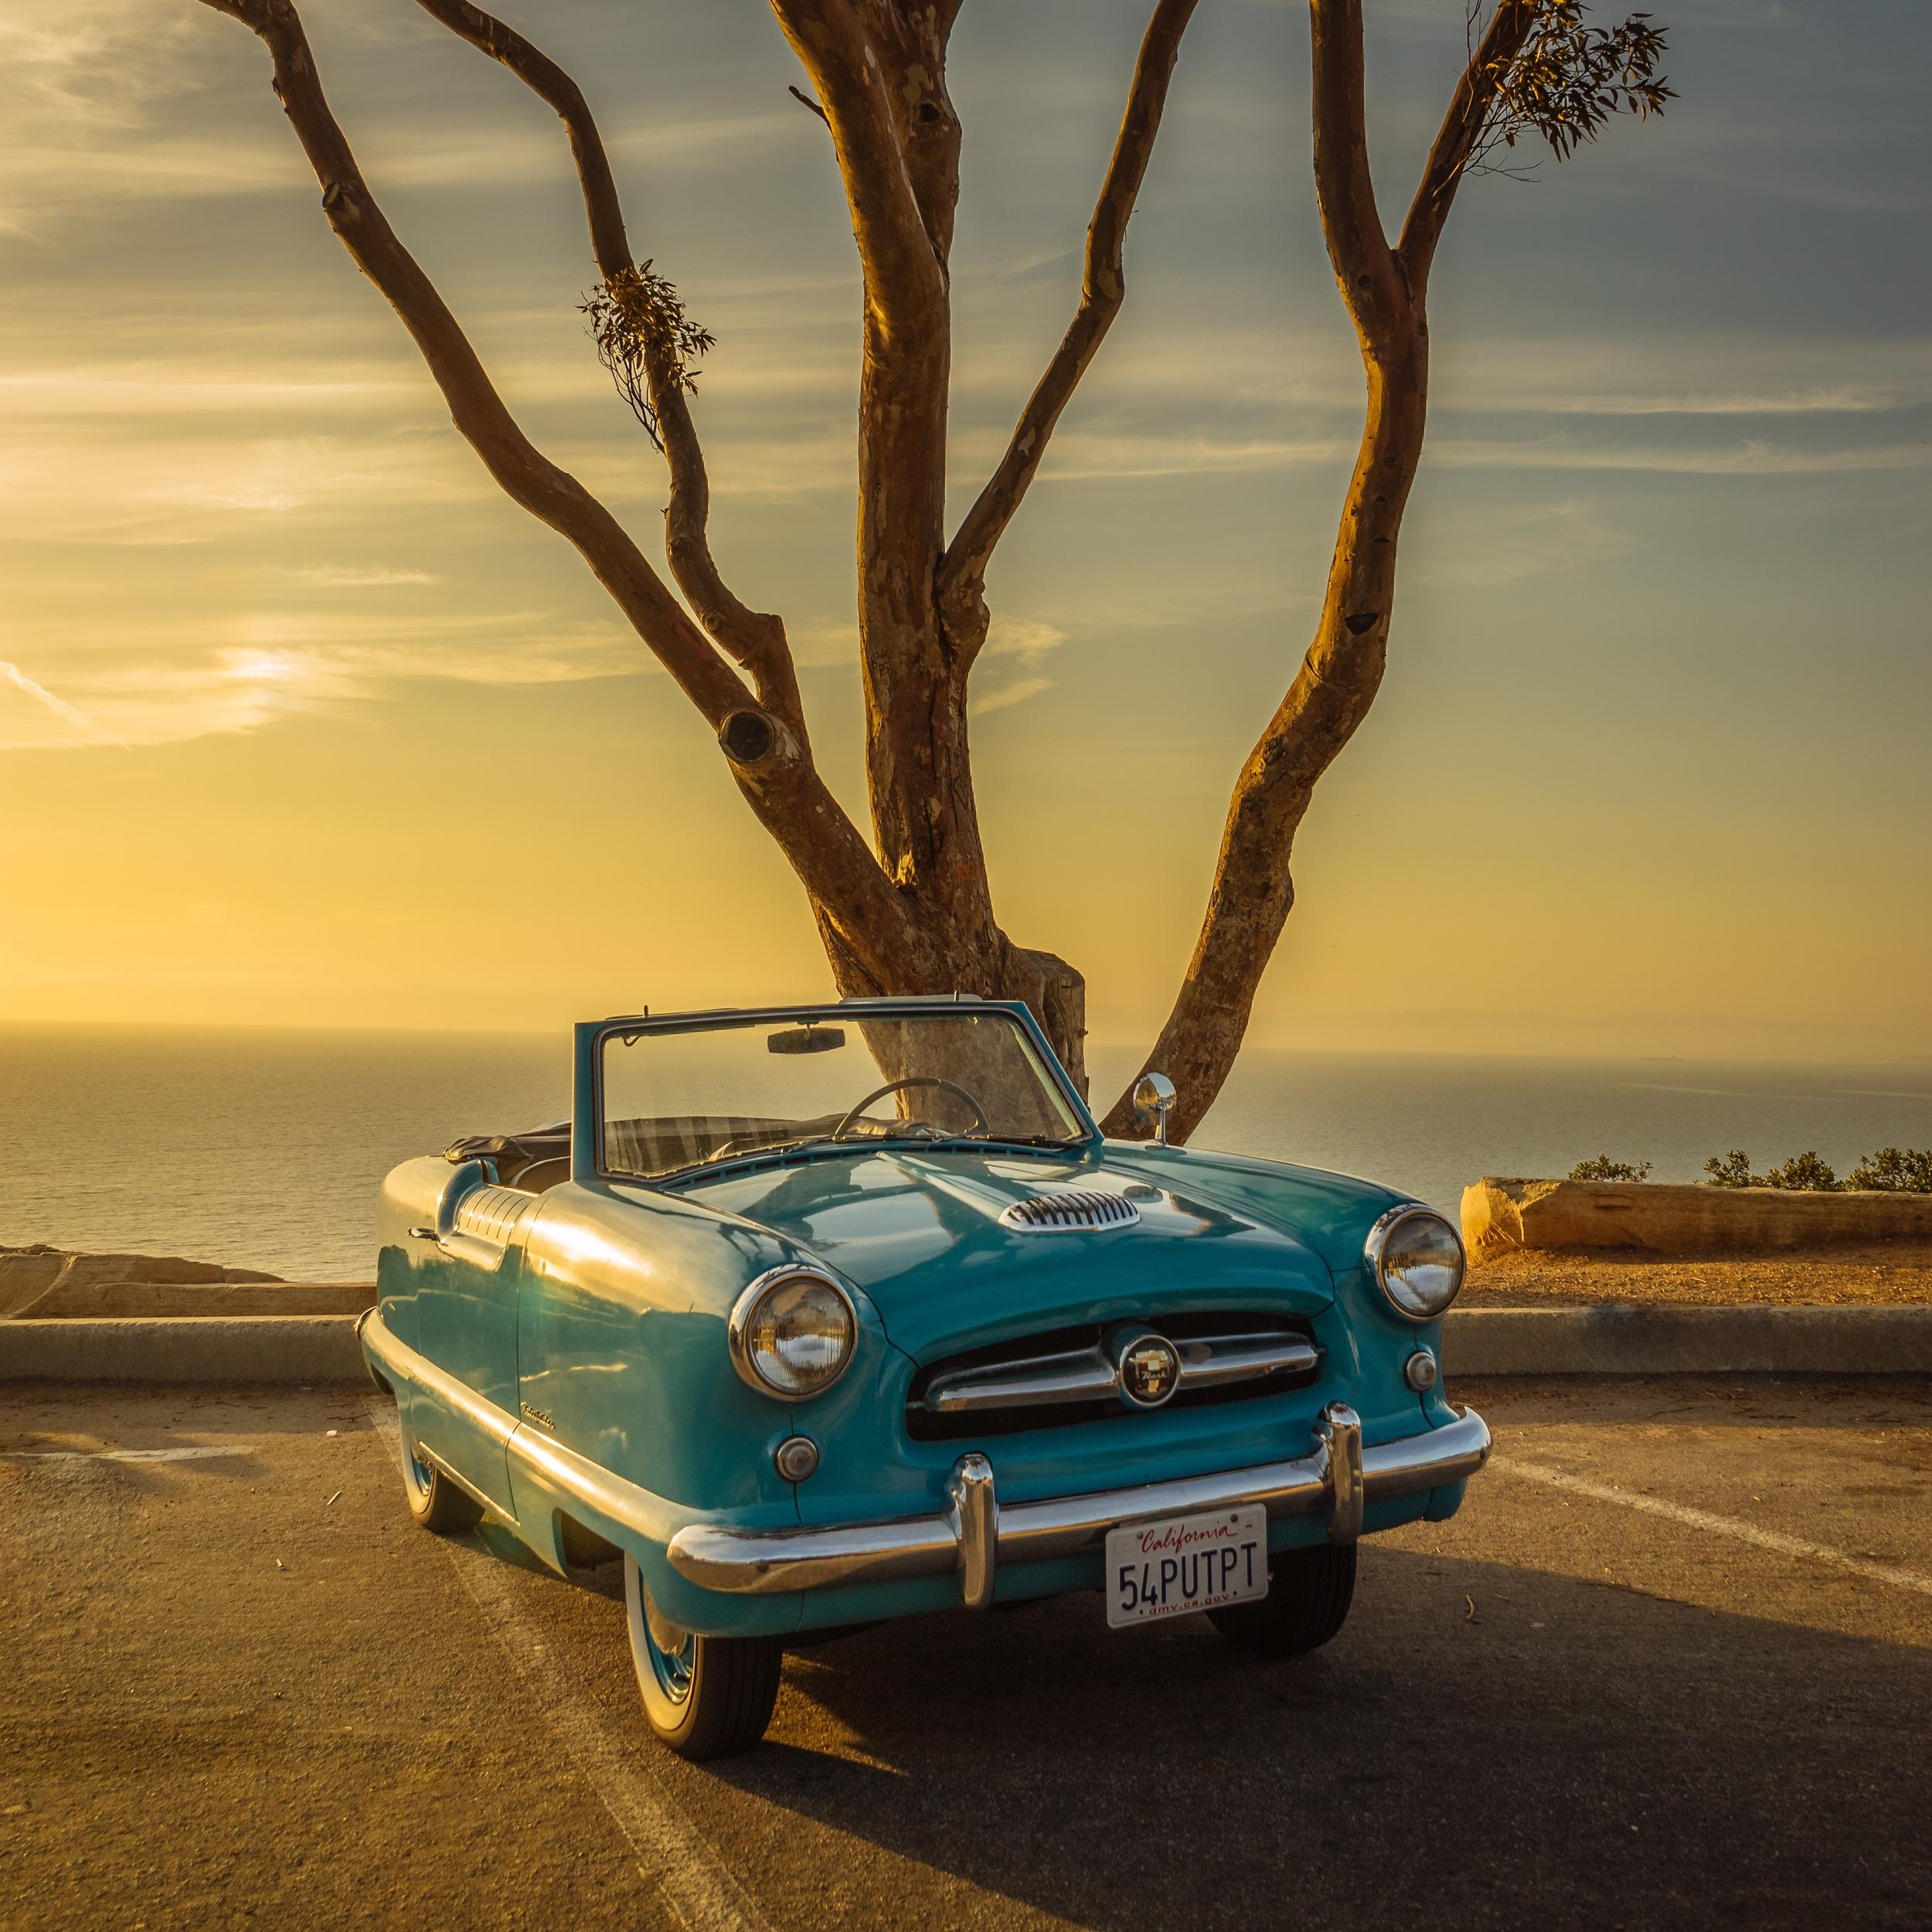 Cutest car in Palos Verdes, CA